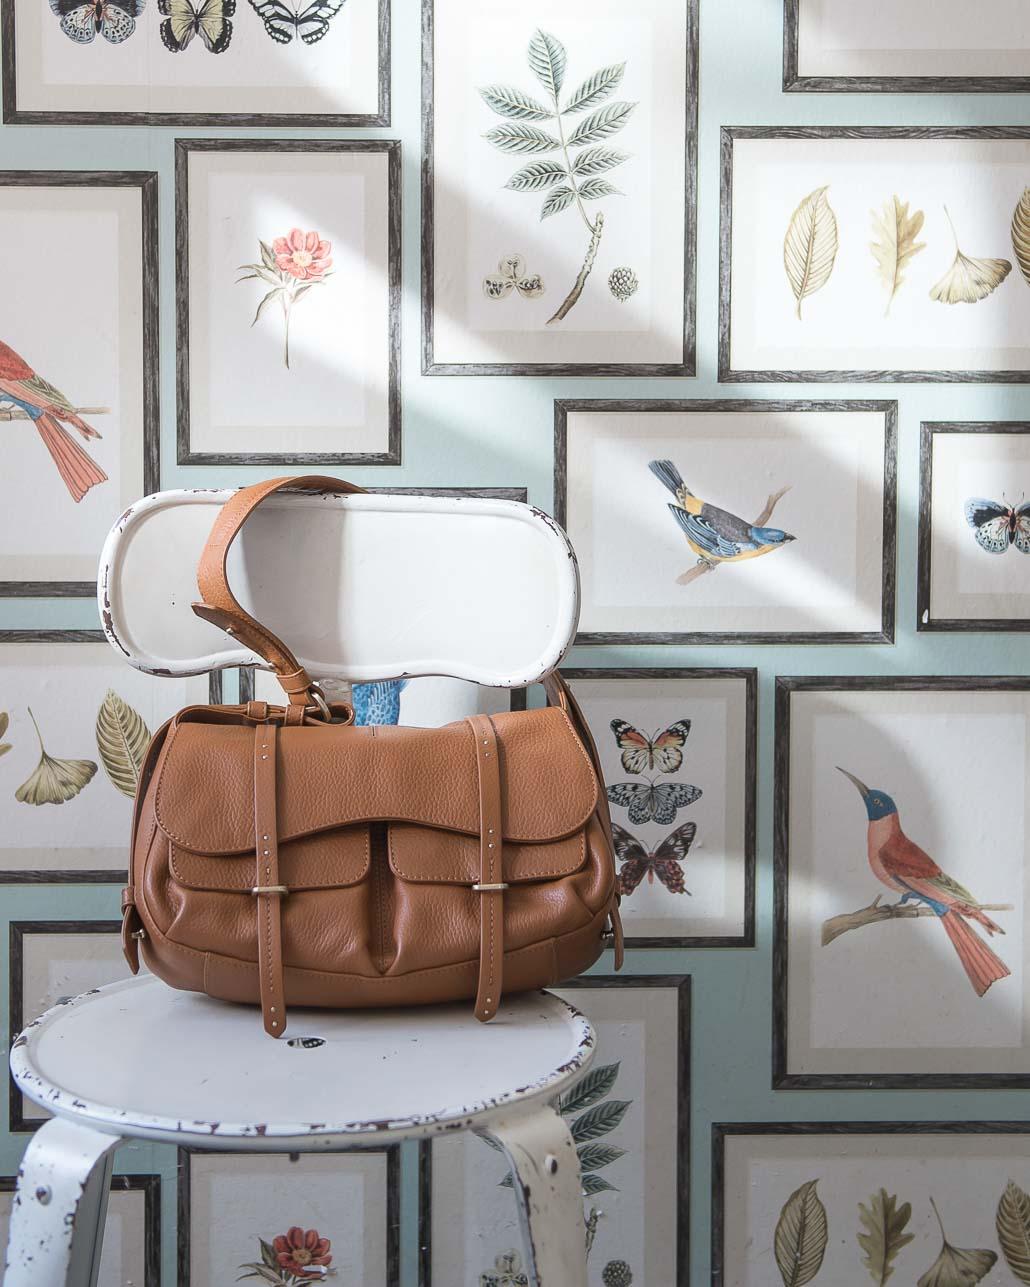 Radley luxury handbag